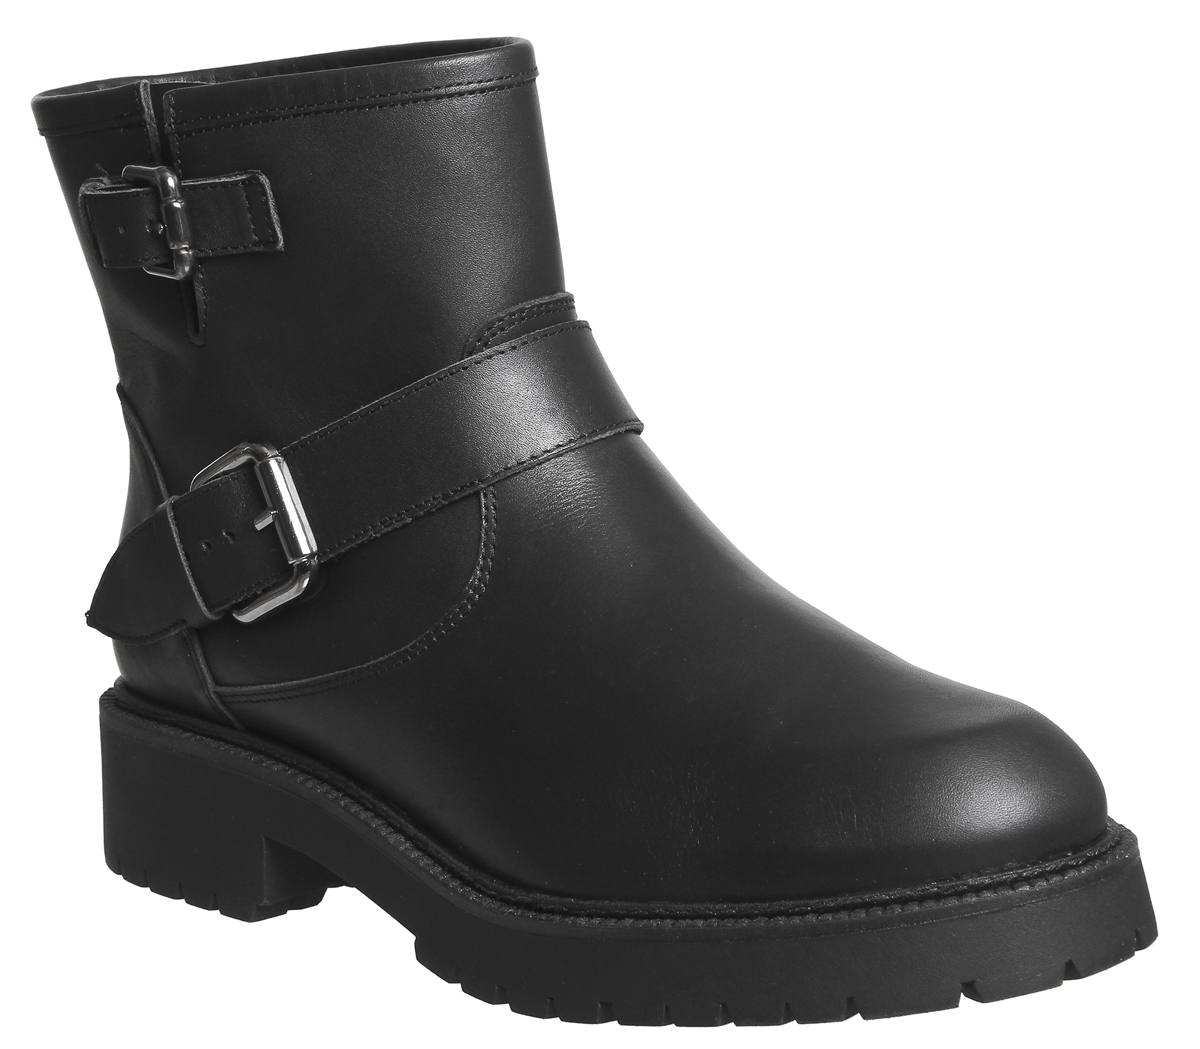 Womens Office Amery Buckle Biker Boots Black Leather